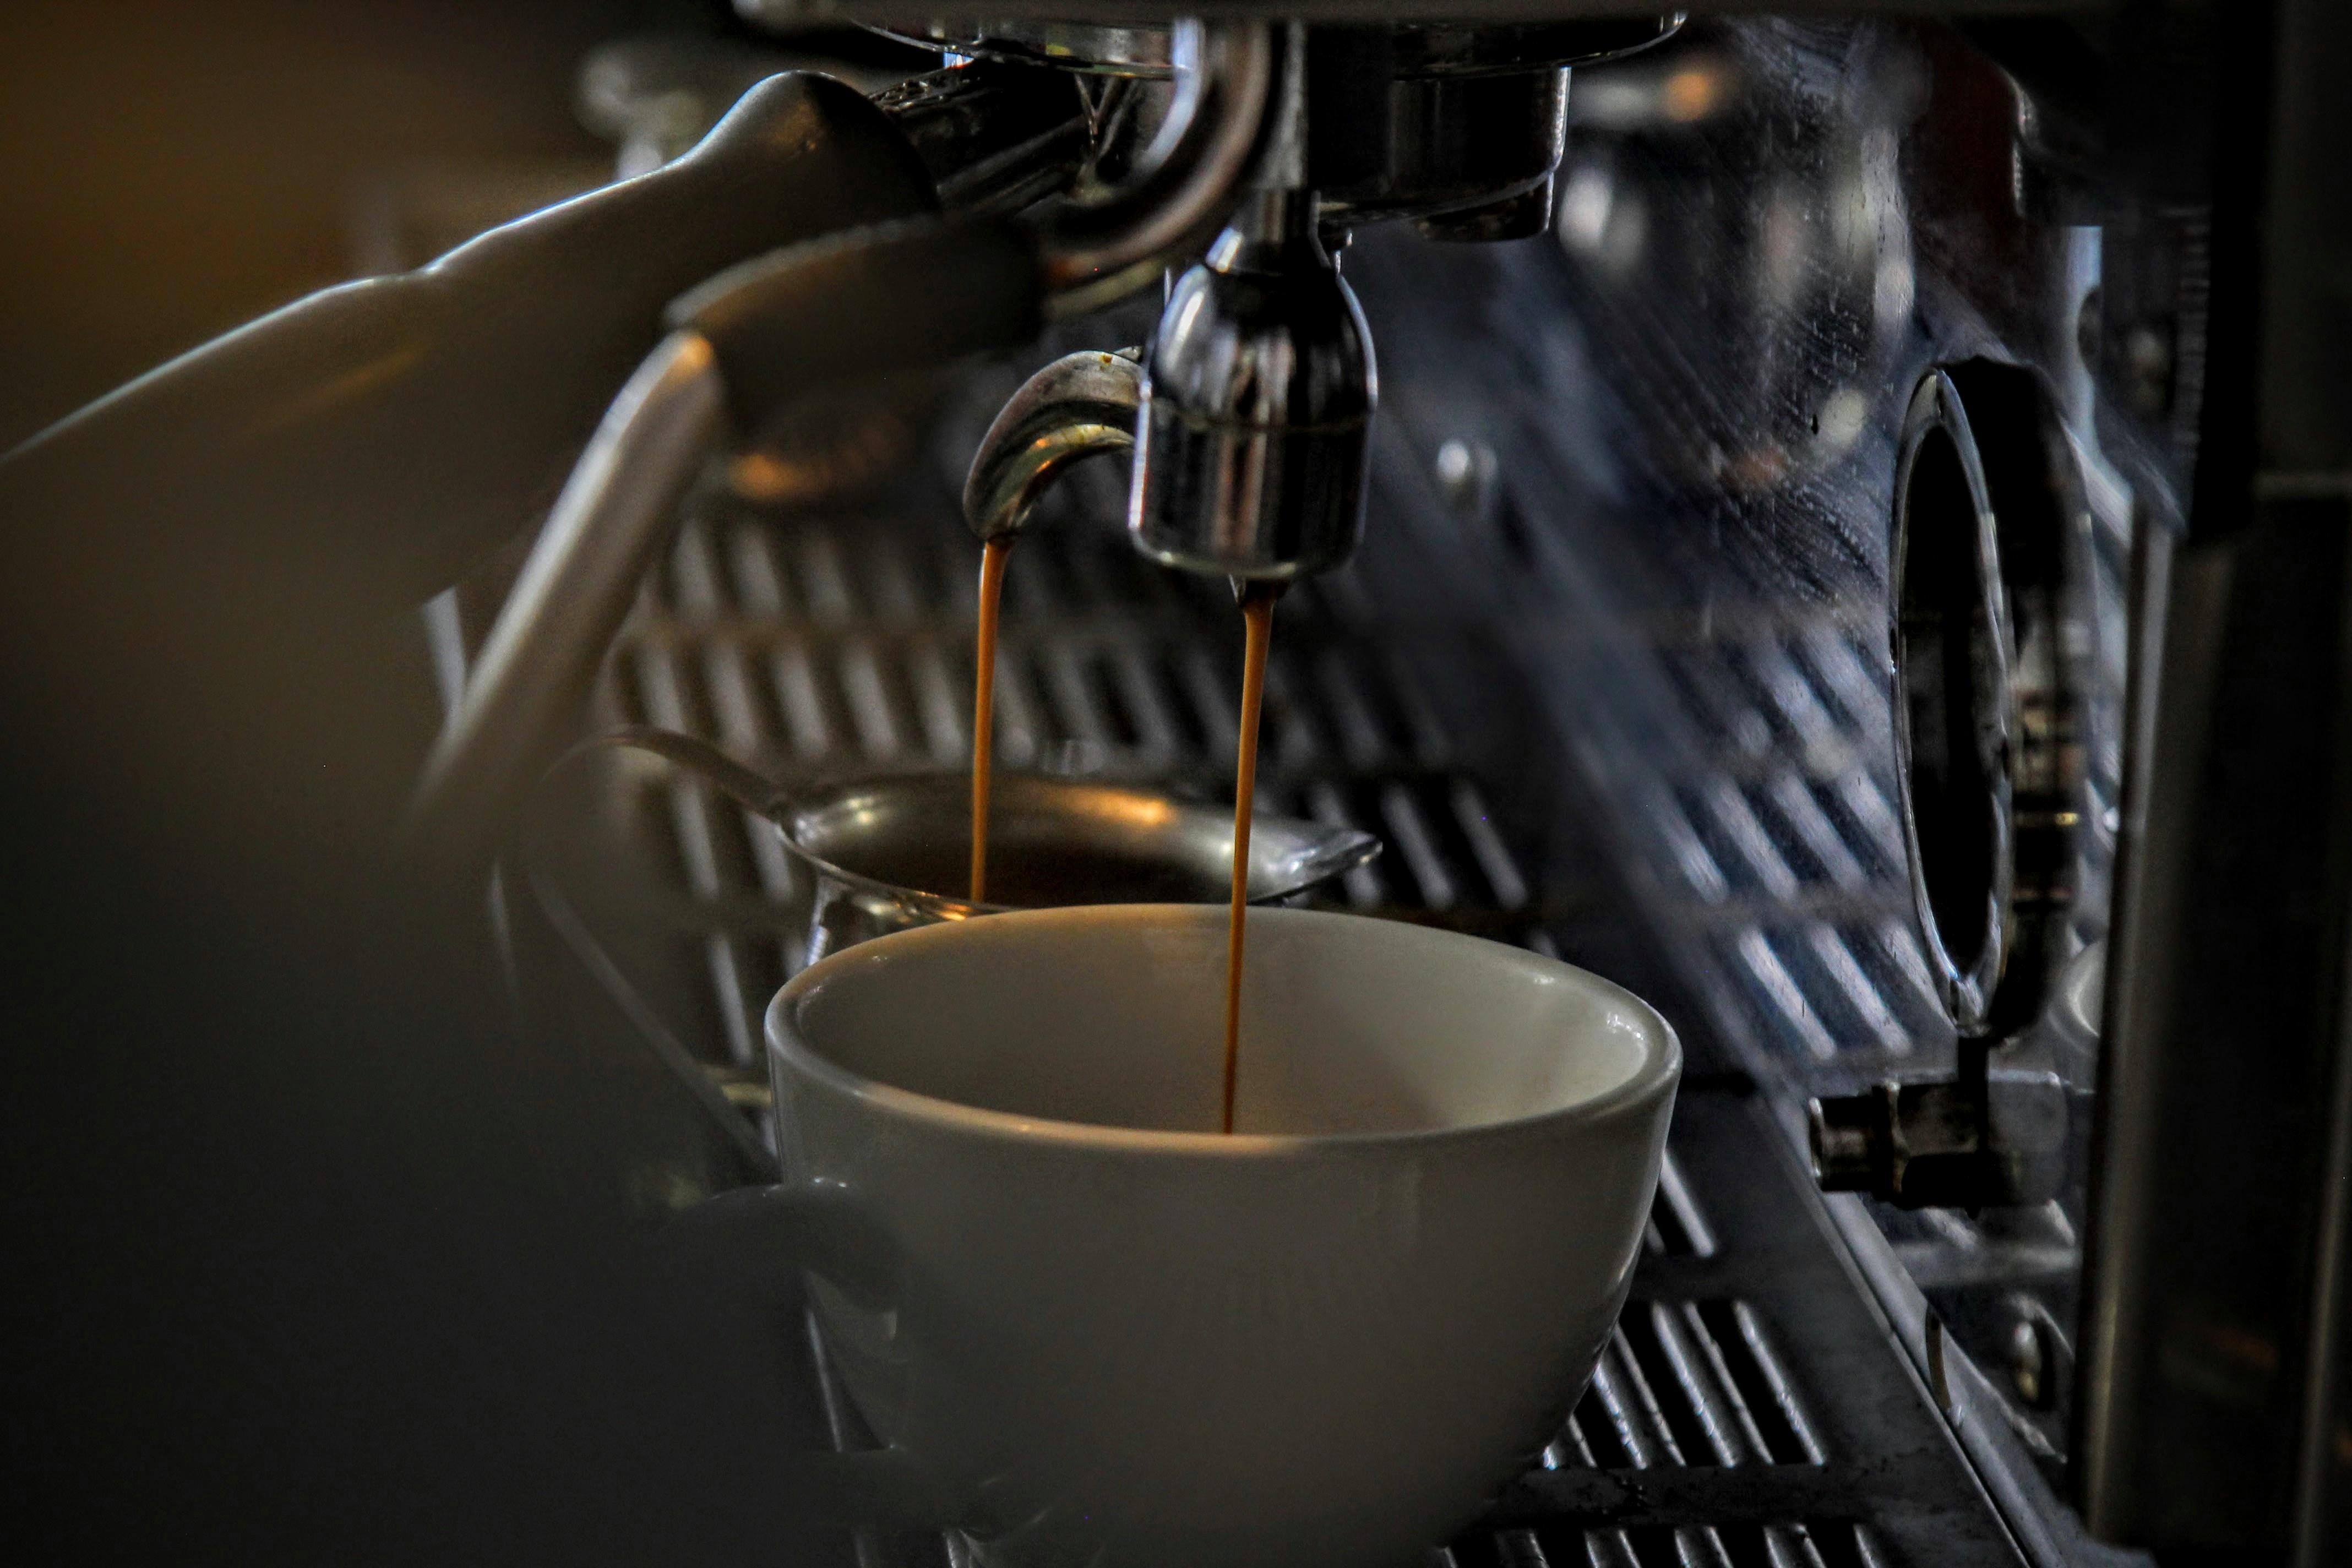 how to get pregnant - alcohol and caffeine